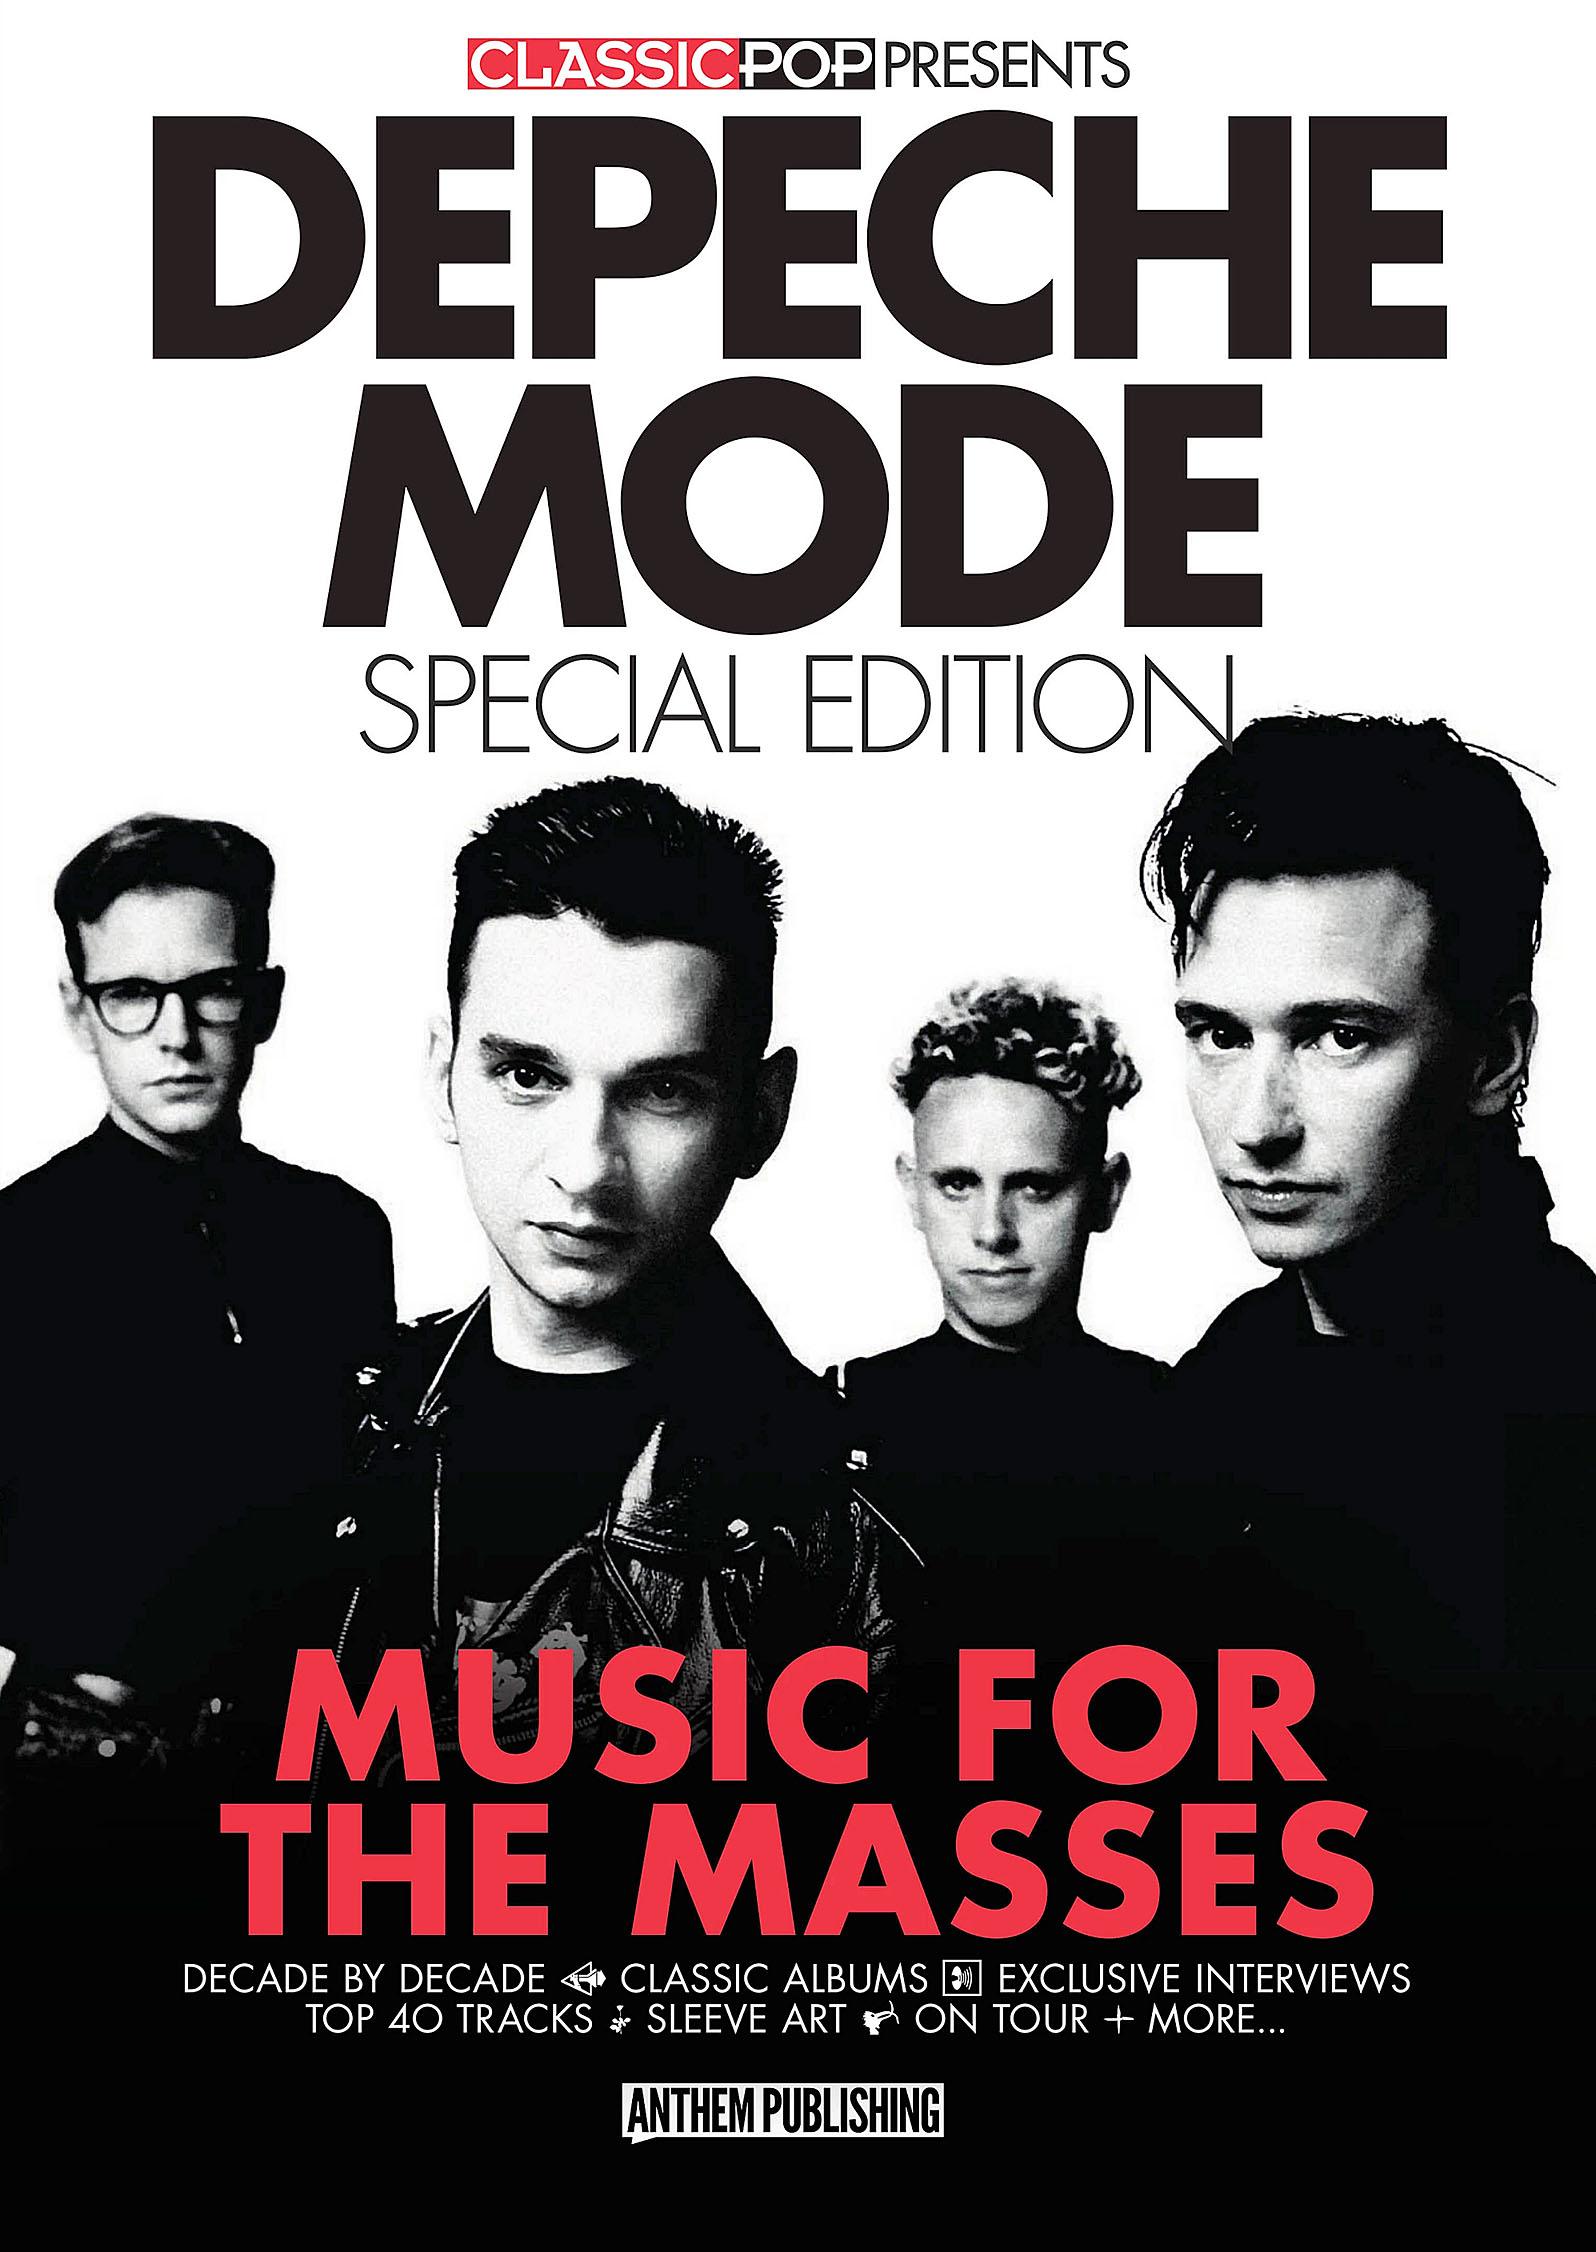 Classic POP - Depeche Mode001.jpg